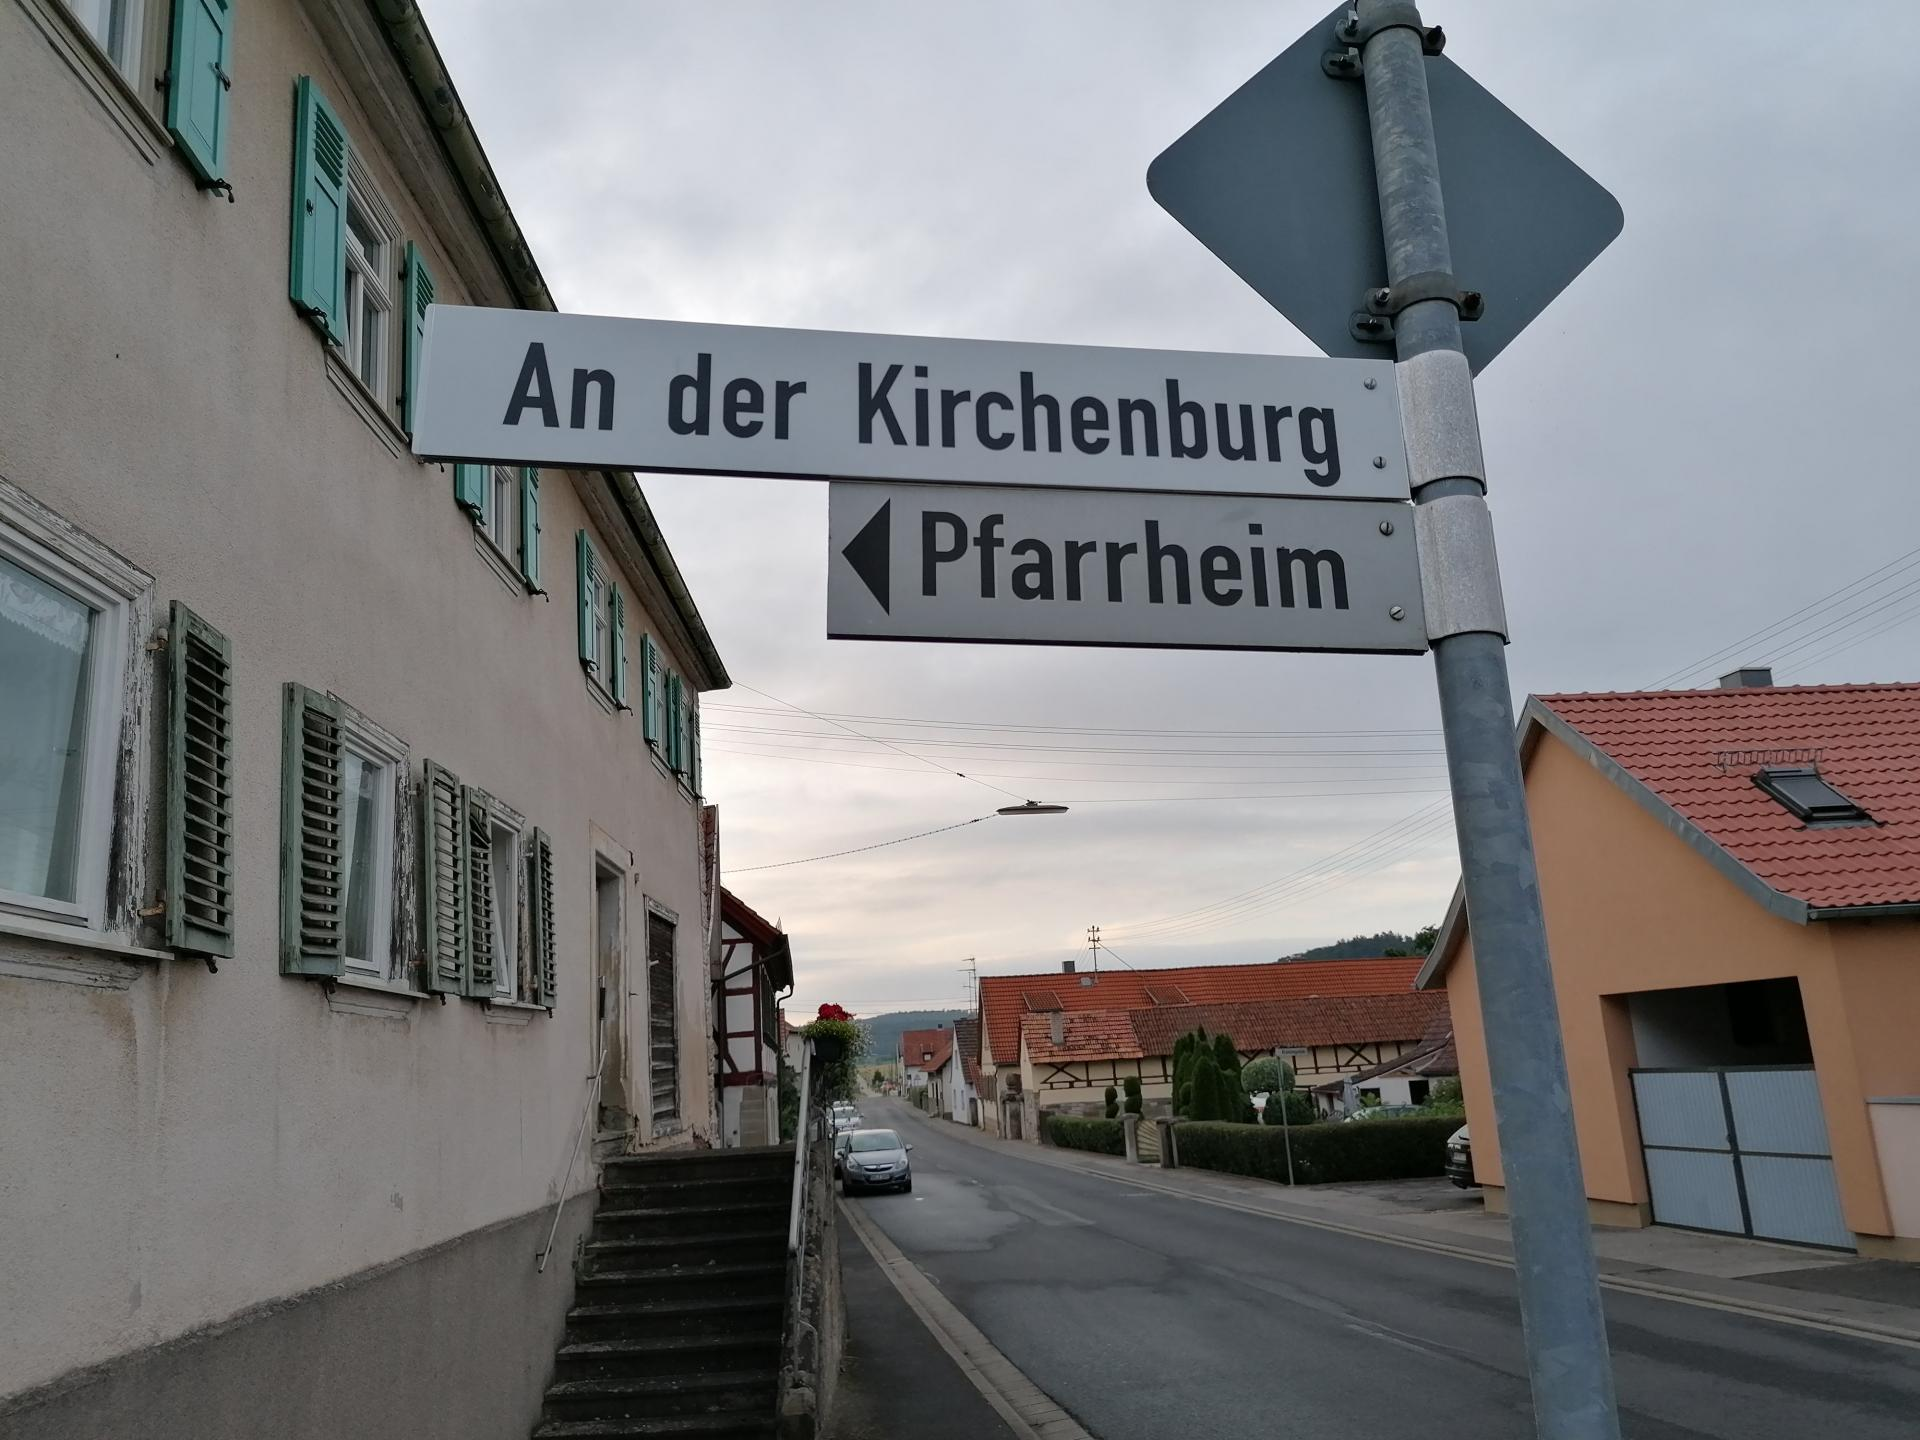 An der Kirchenburg